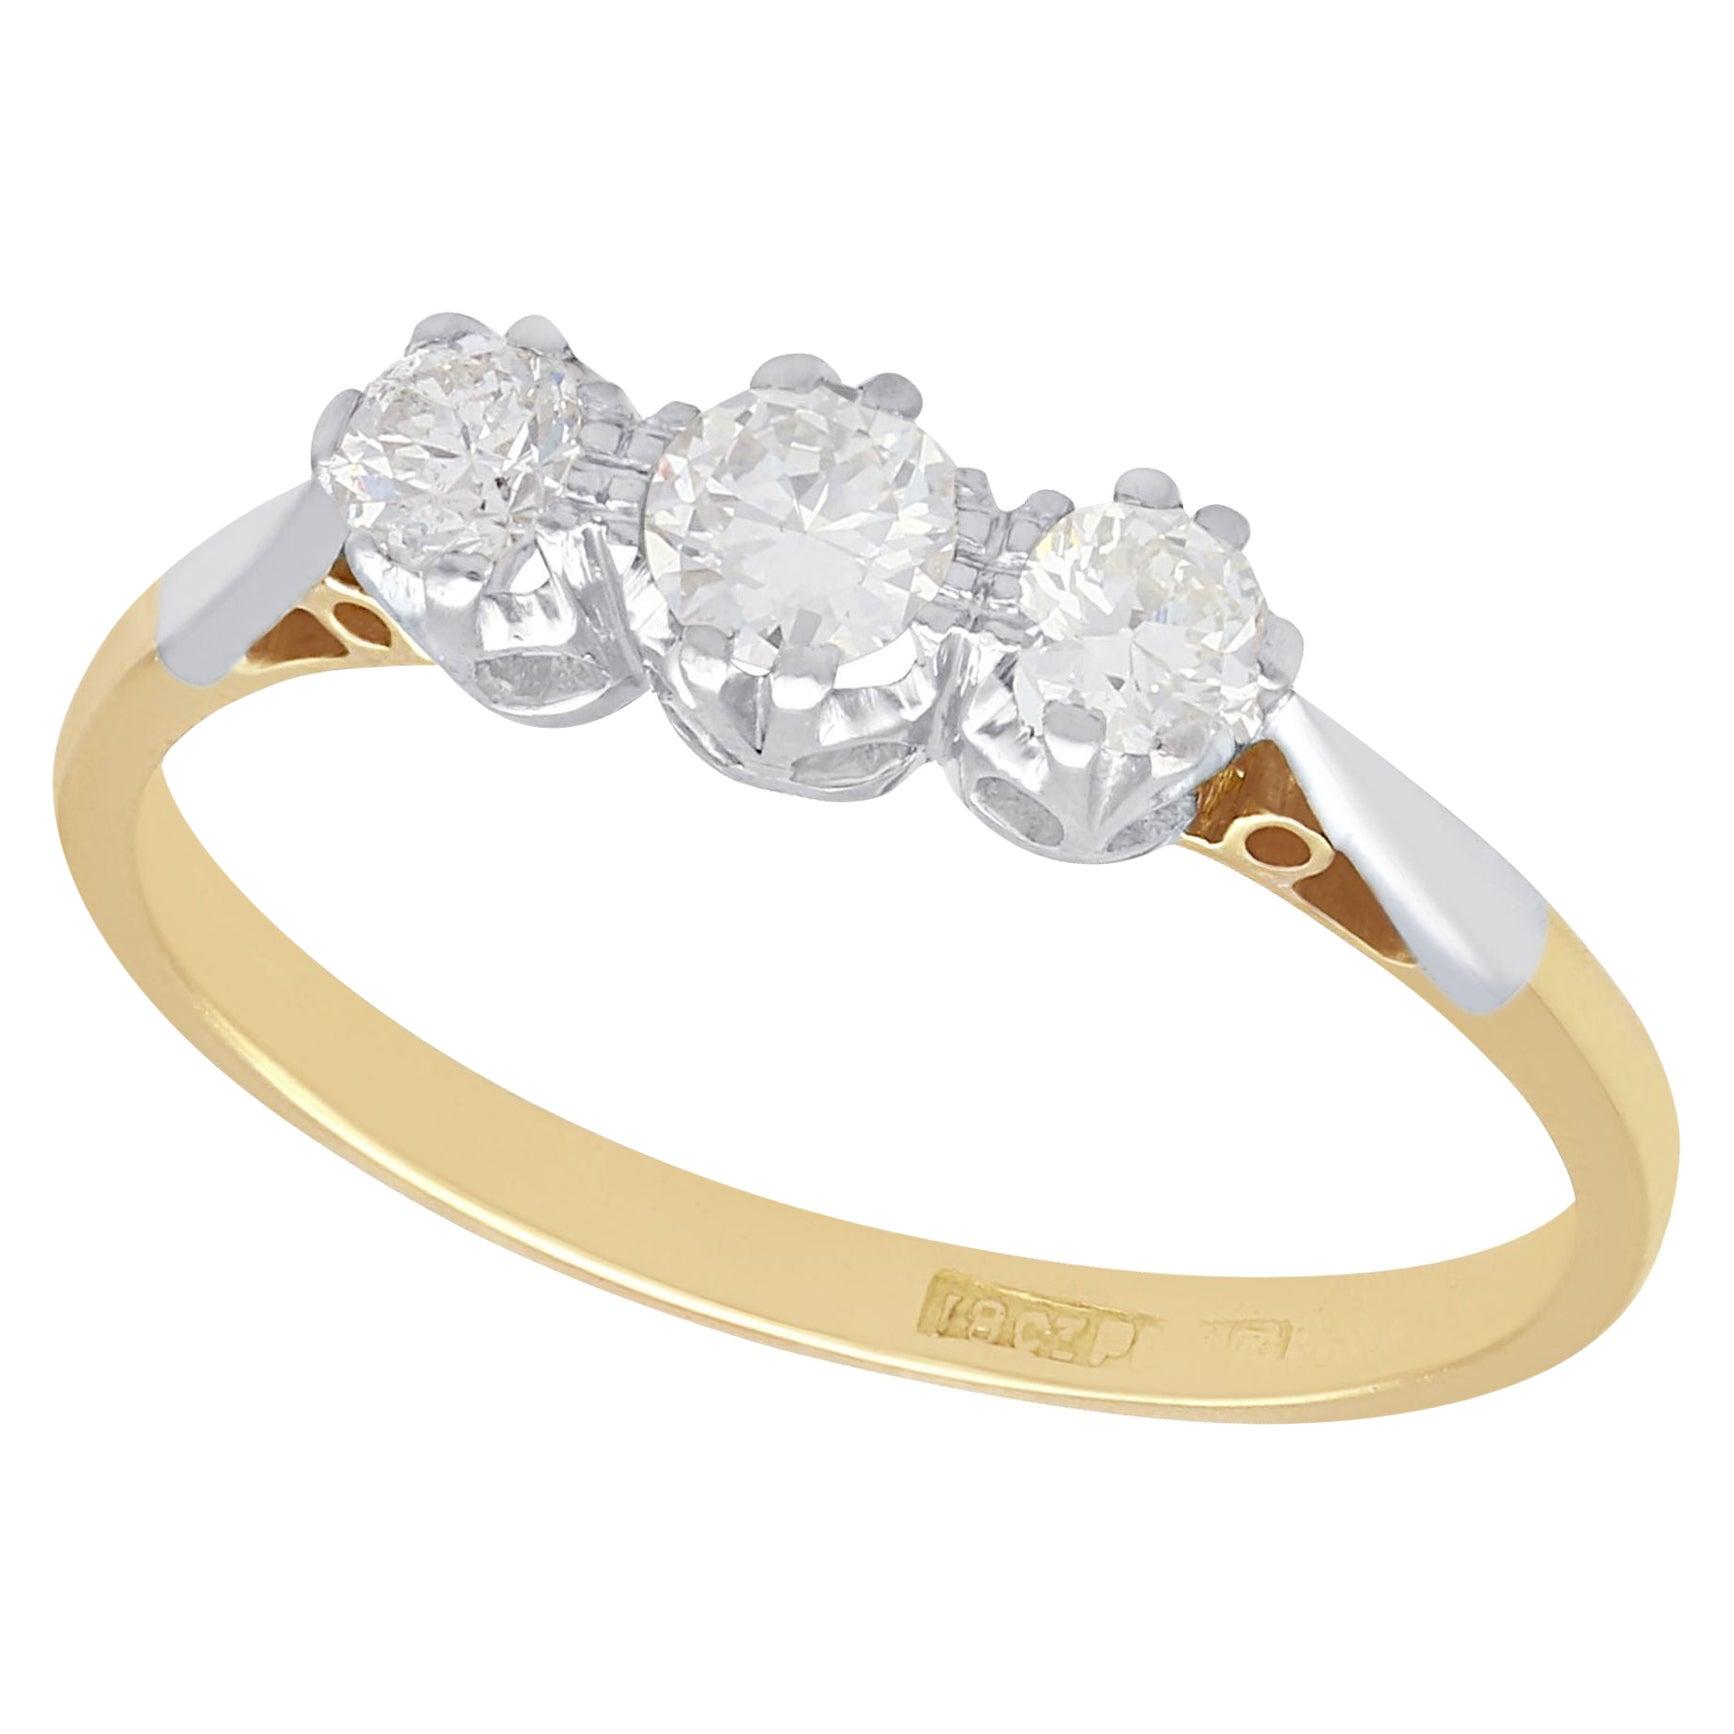 Antique 1930s Diamond Yellow Gold Trilogy Ring